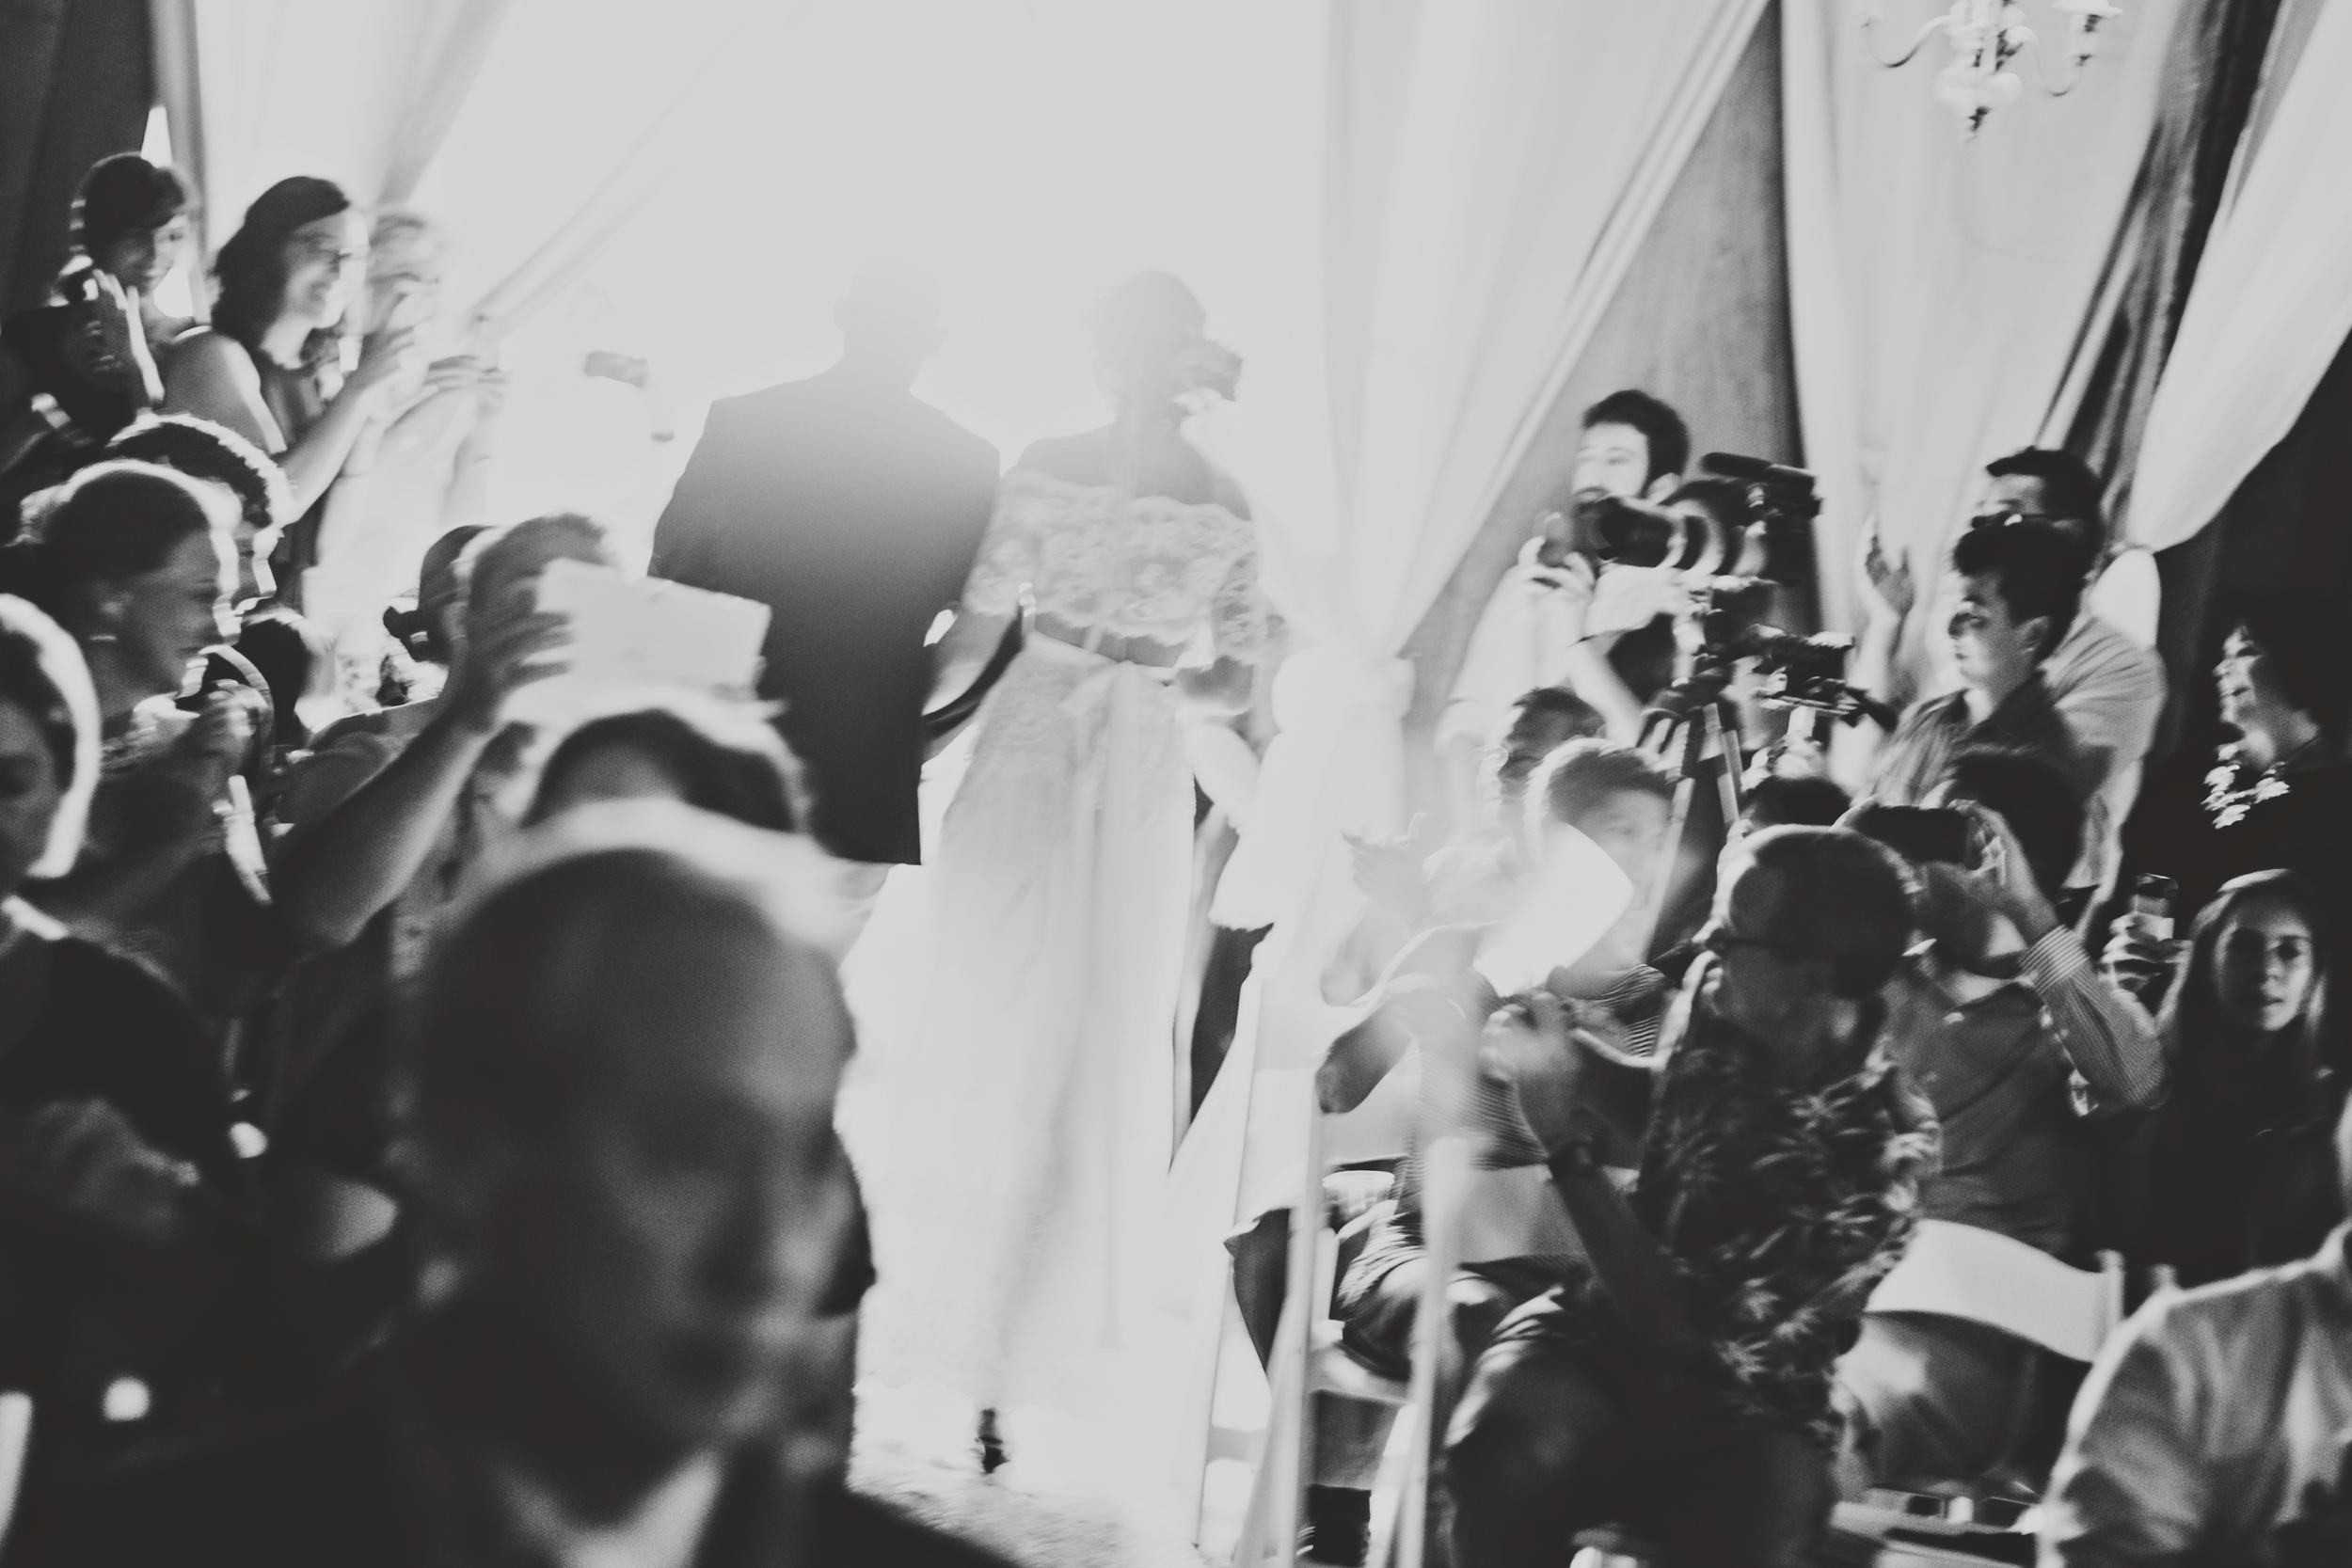 angie-diaz-photography-oahu-hawaii-wedding-tradewinds-ranch-66.jpg